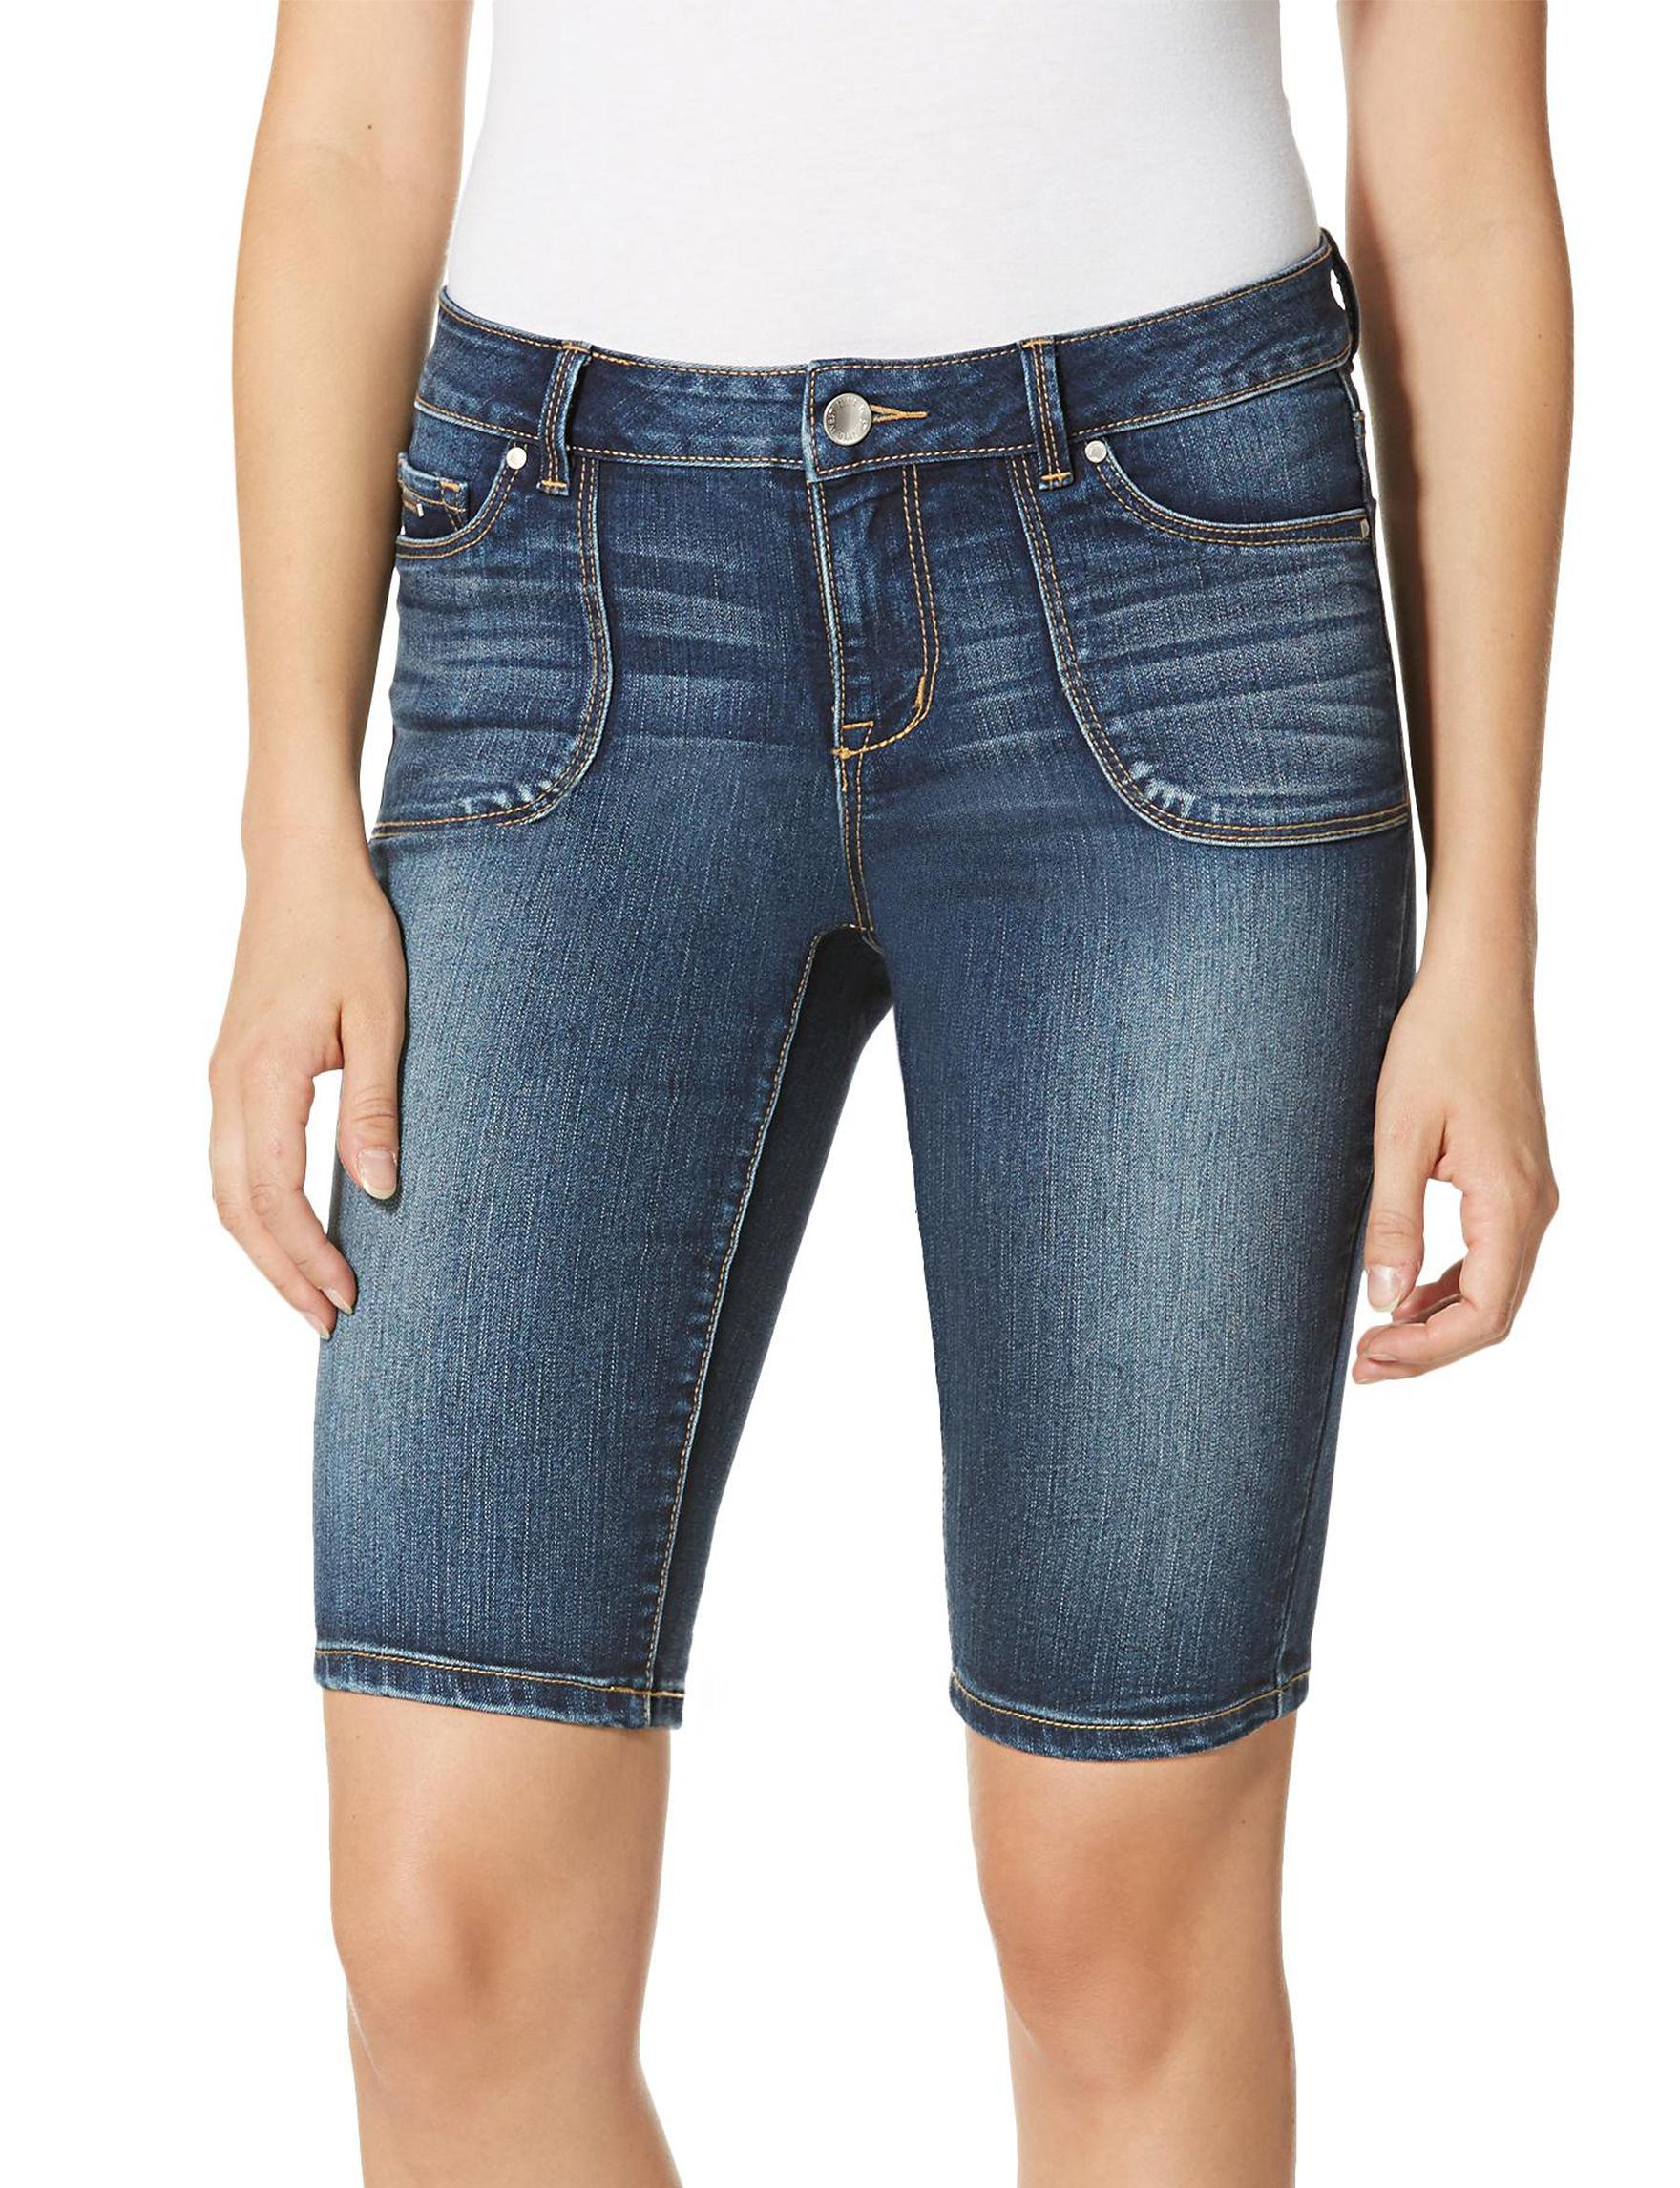 Nine West Jeans Blue Denim Shorts